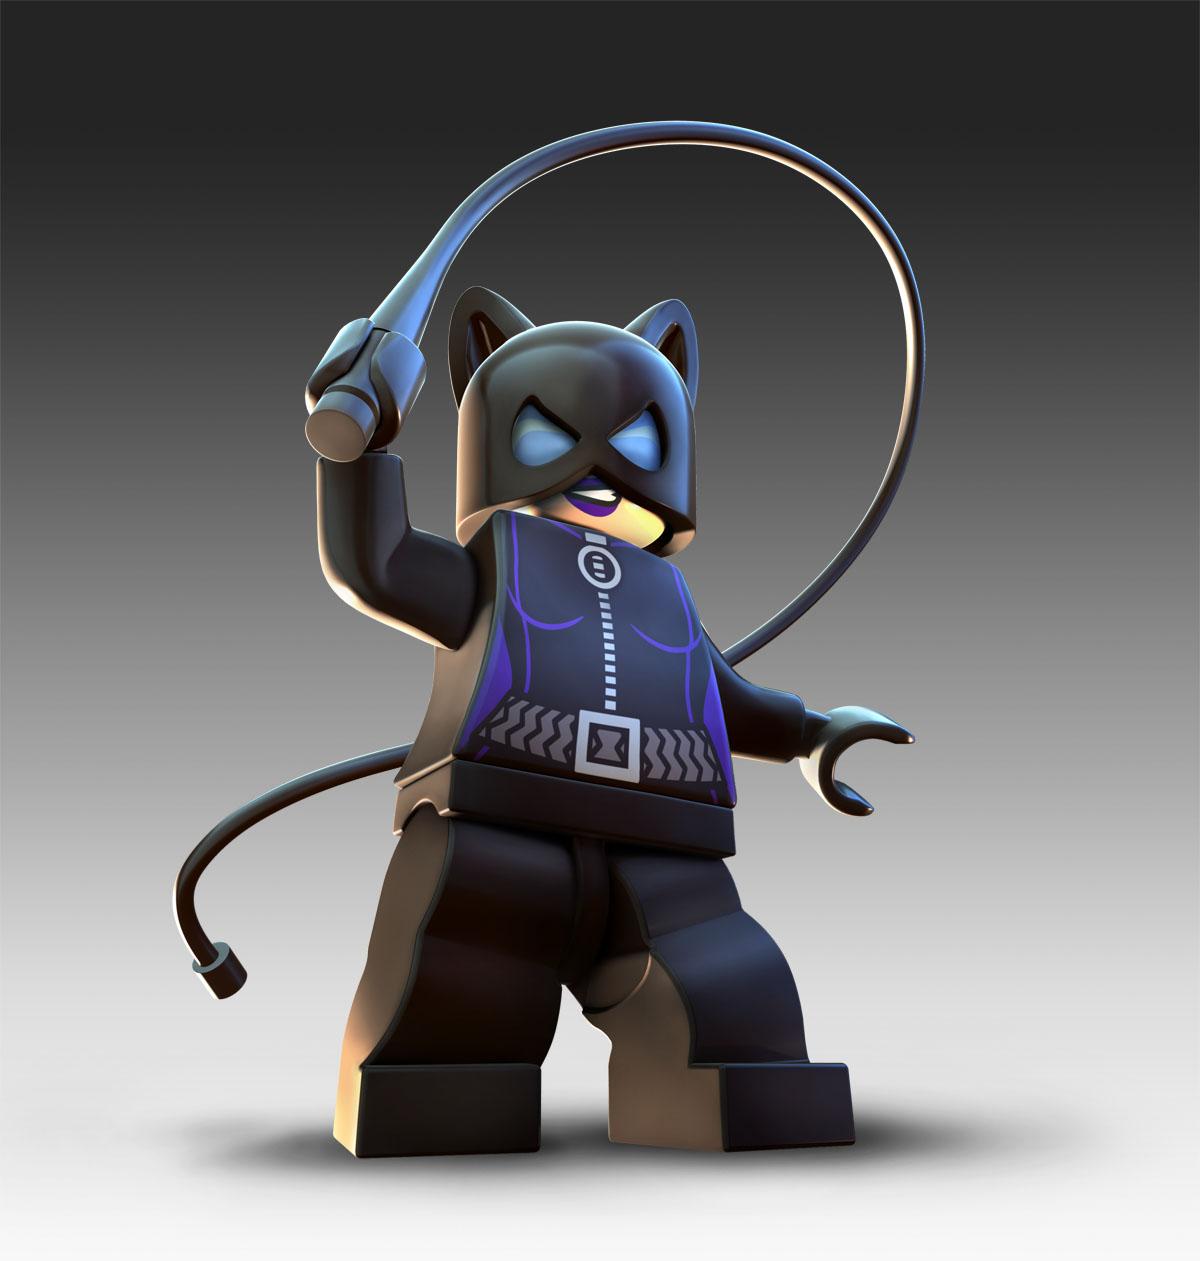 Selina Kyle (Lego Batman)